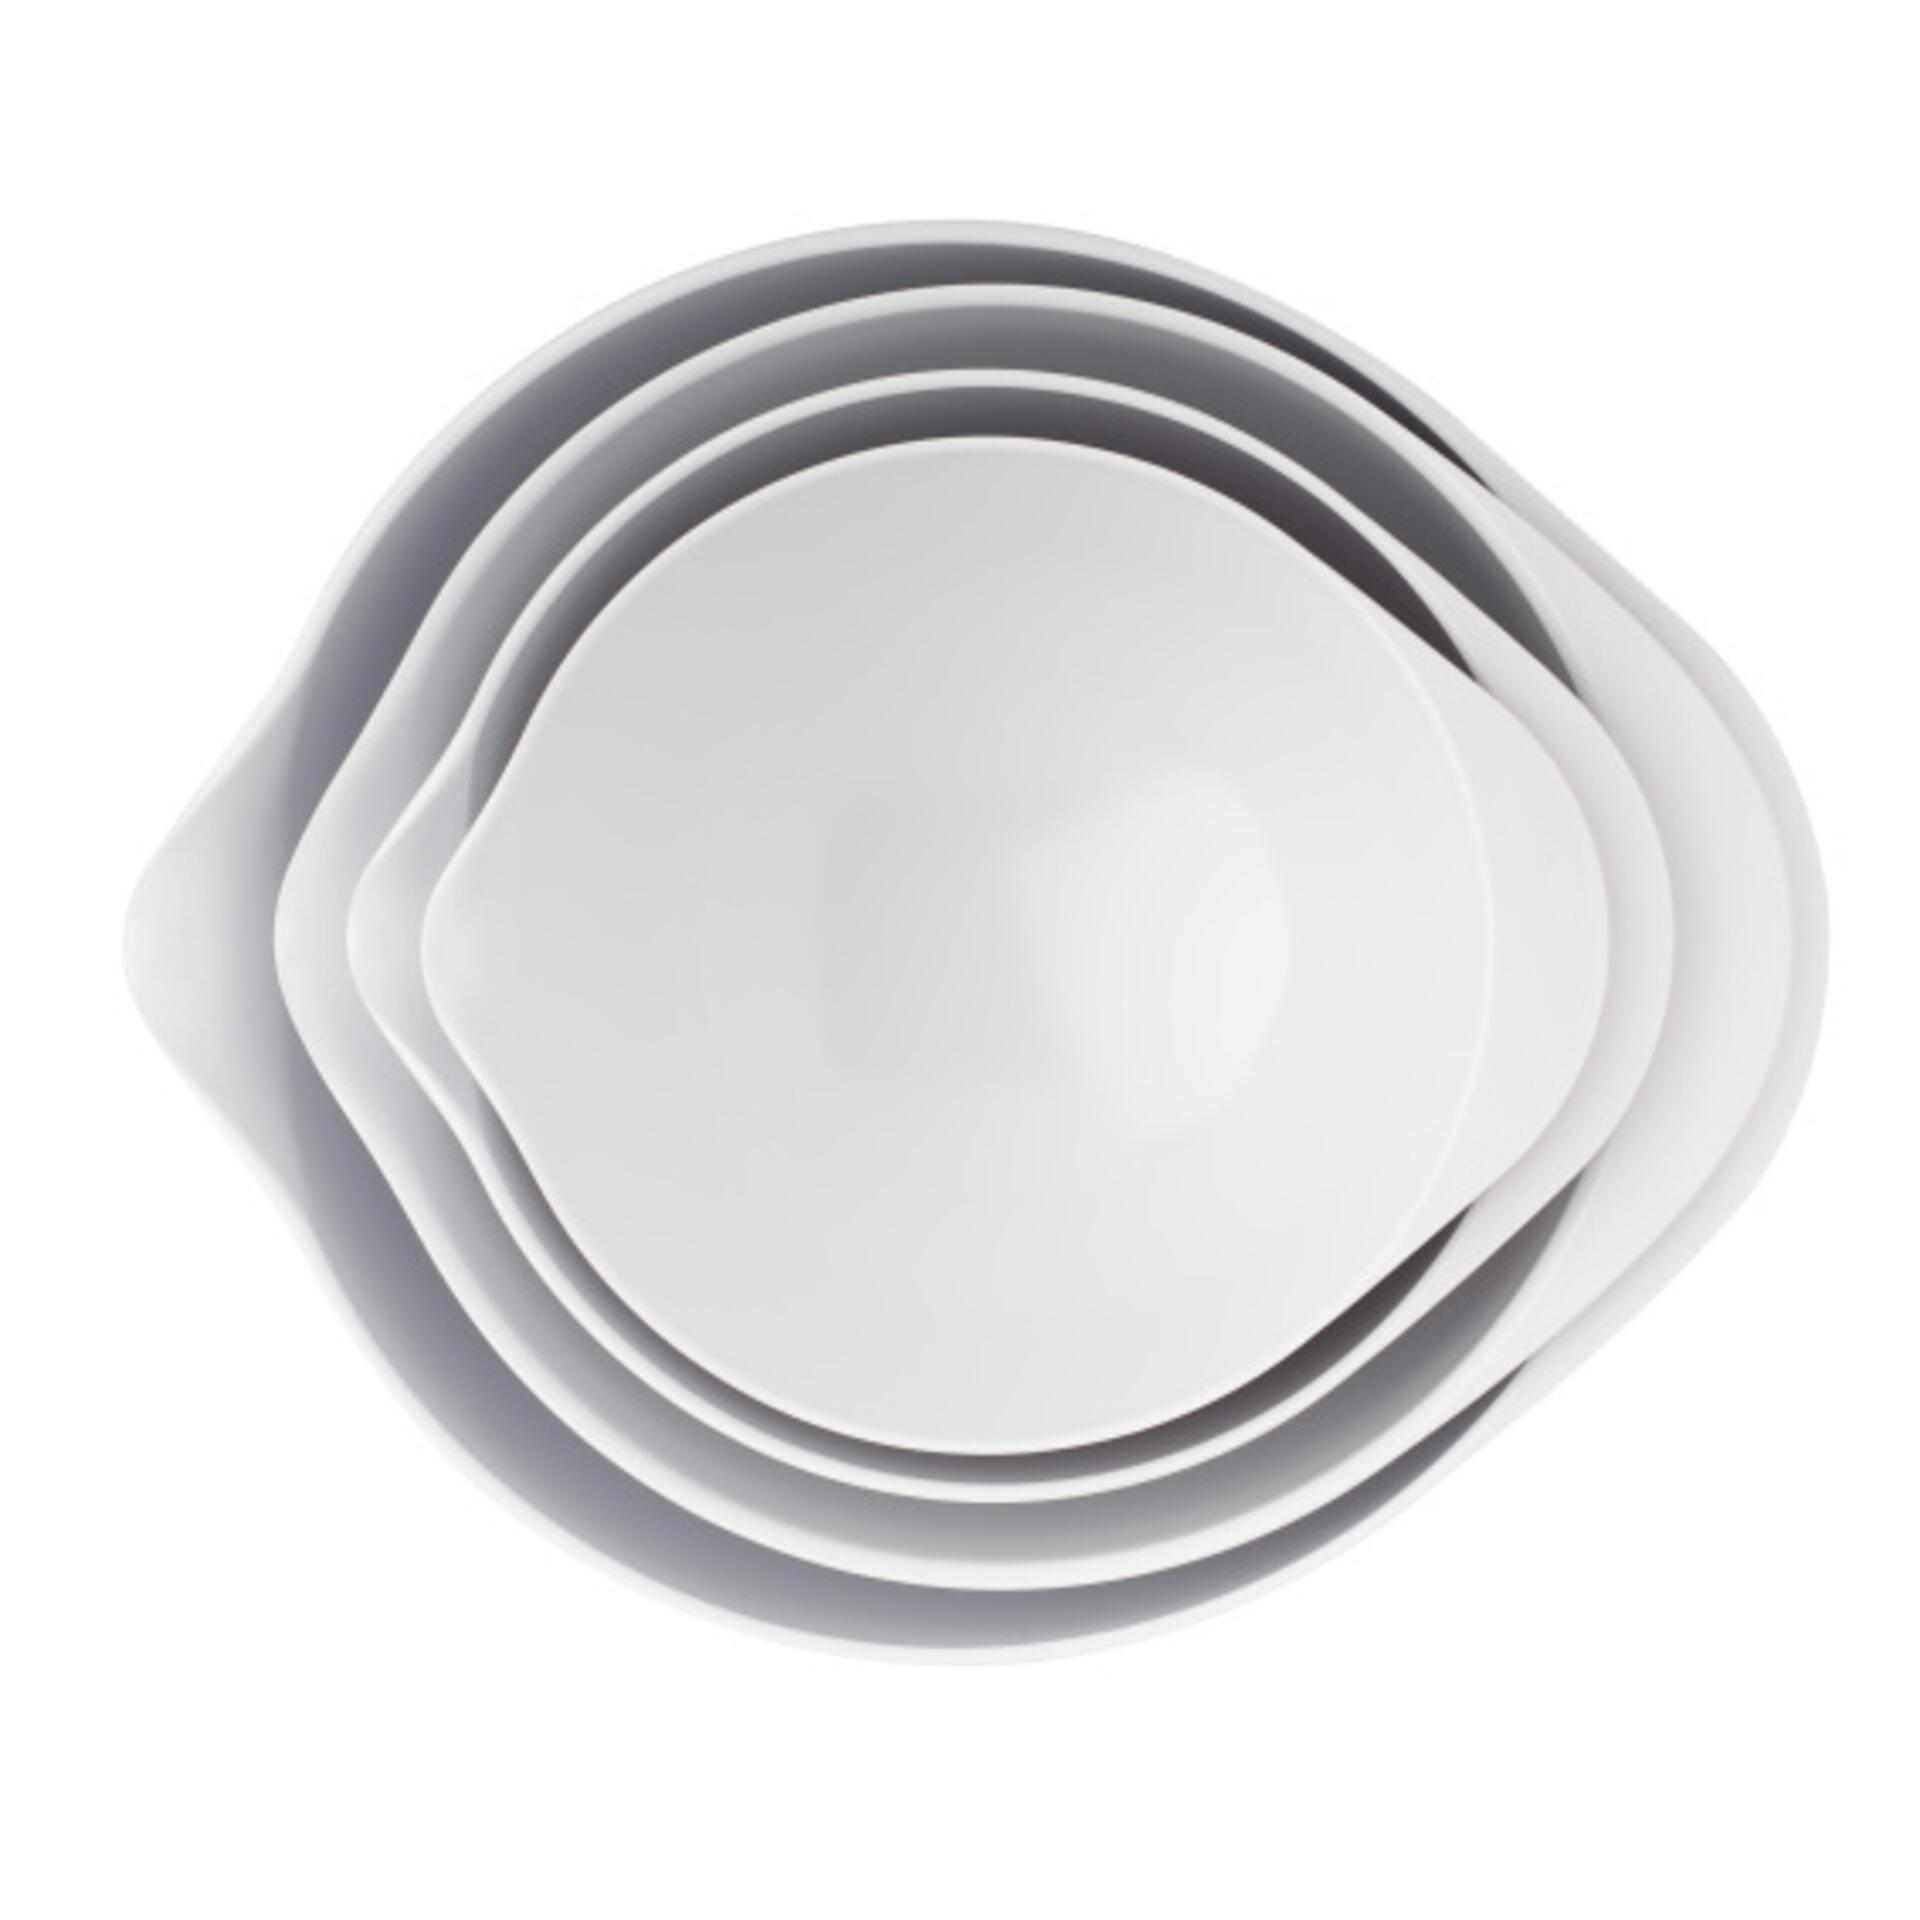 Rosti Mepal Margrethe Rührschüssel 3,0 Liter Weiß